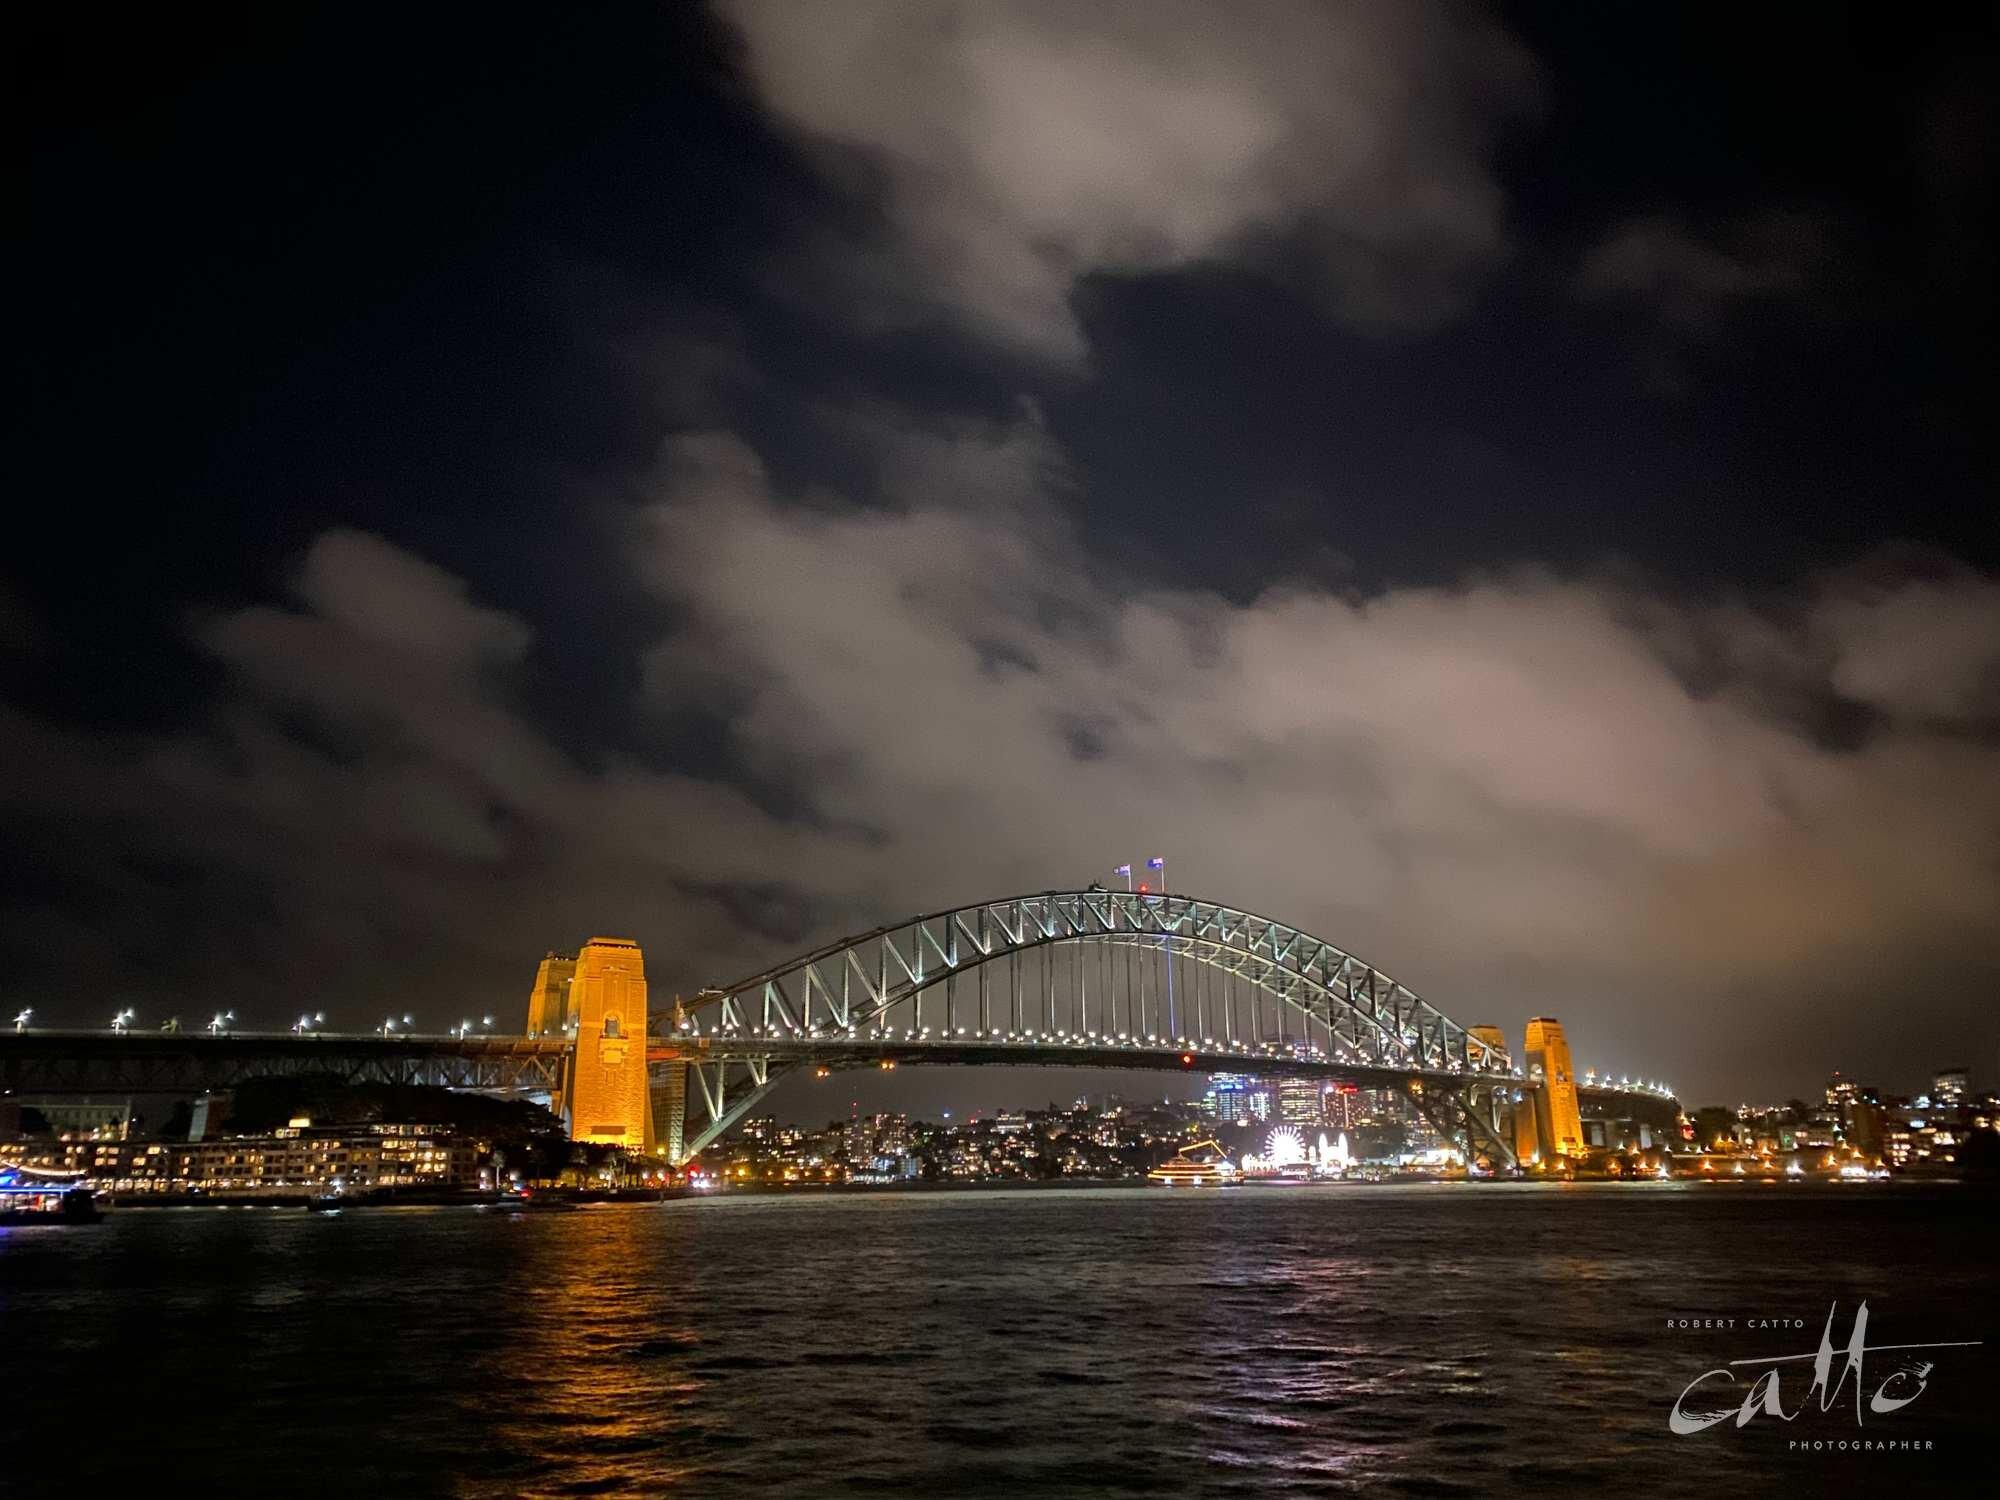 Sydney Harbour Bridge at night (normal lens)